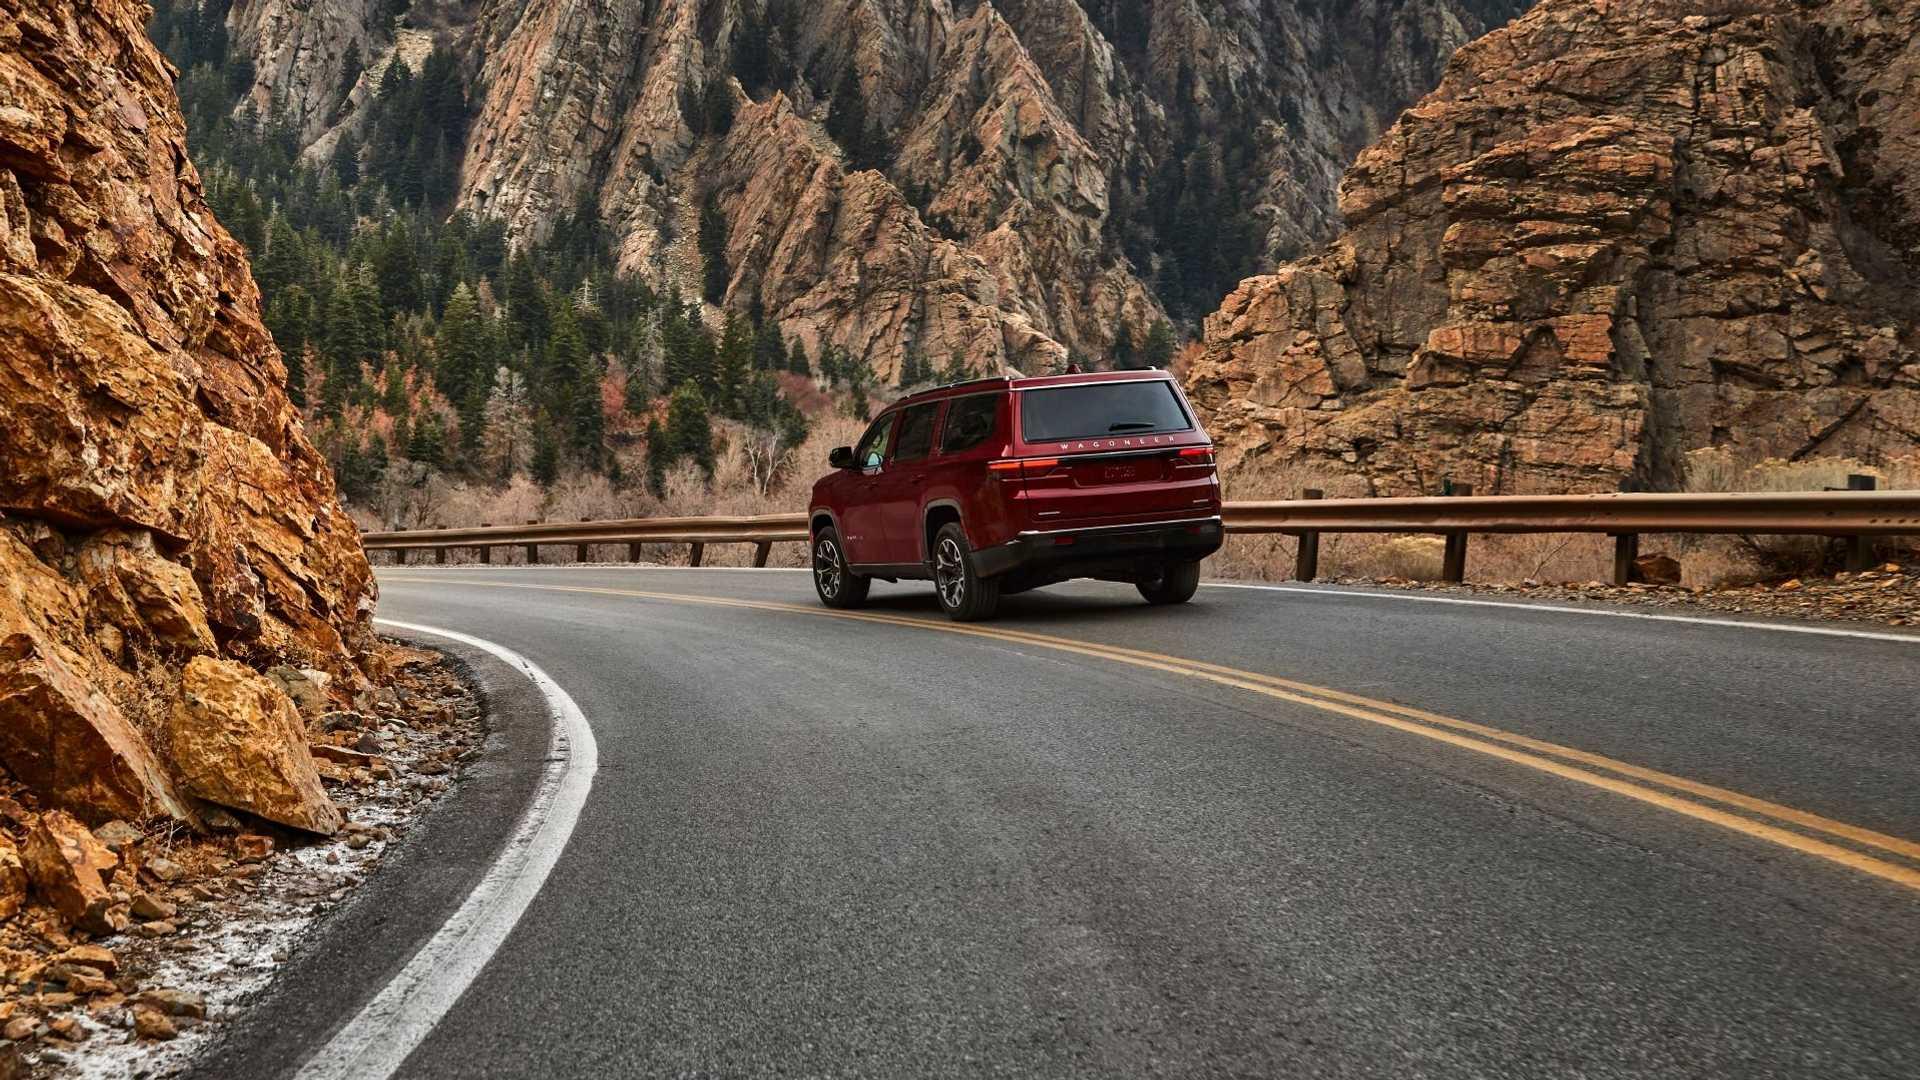 2022-jeep-wagoneer-exterior-rear-quarter-6